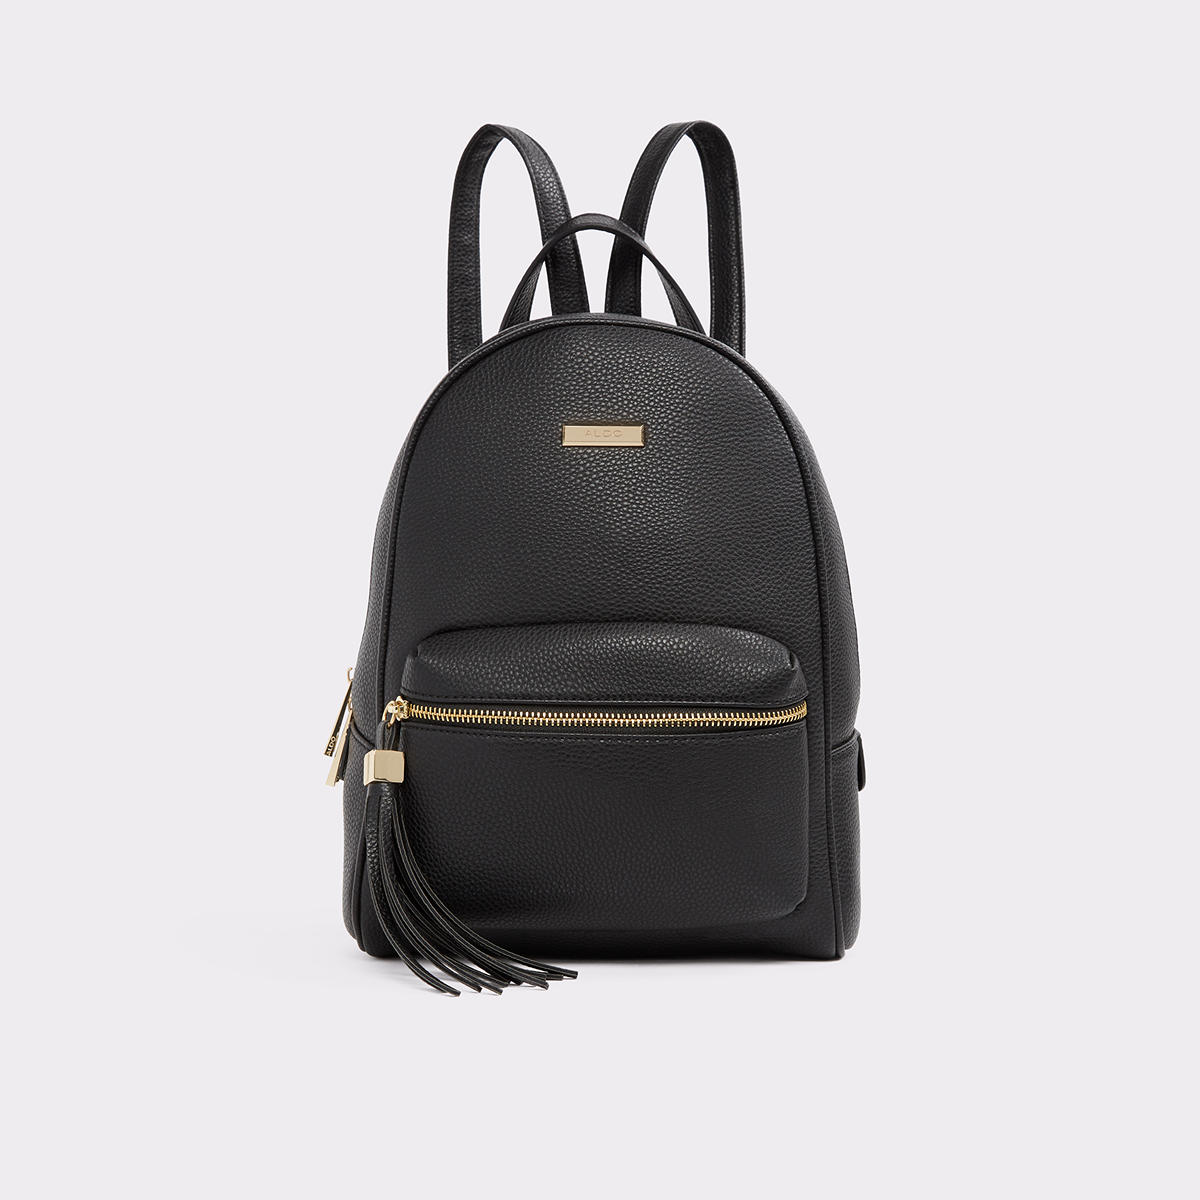 Hanalei Midnight Black Women s Backpacks  6af06e8394f58